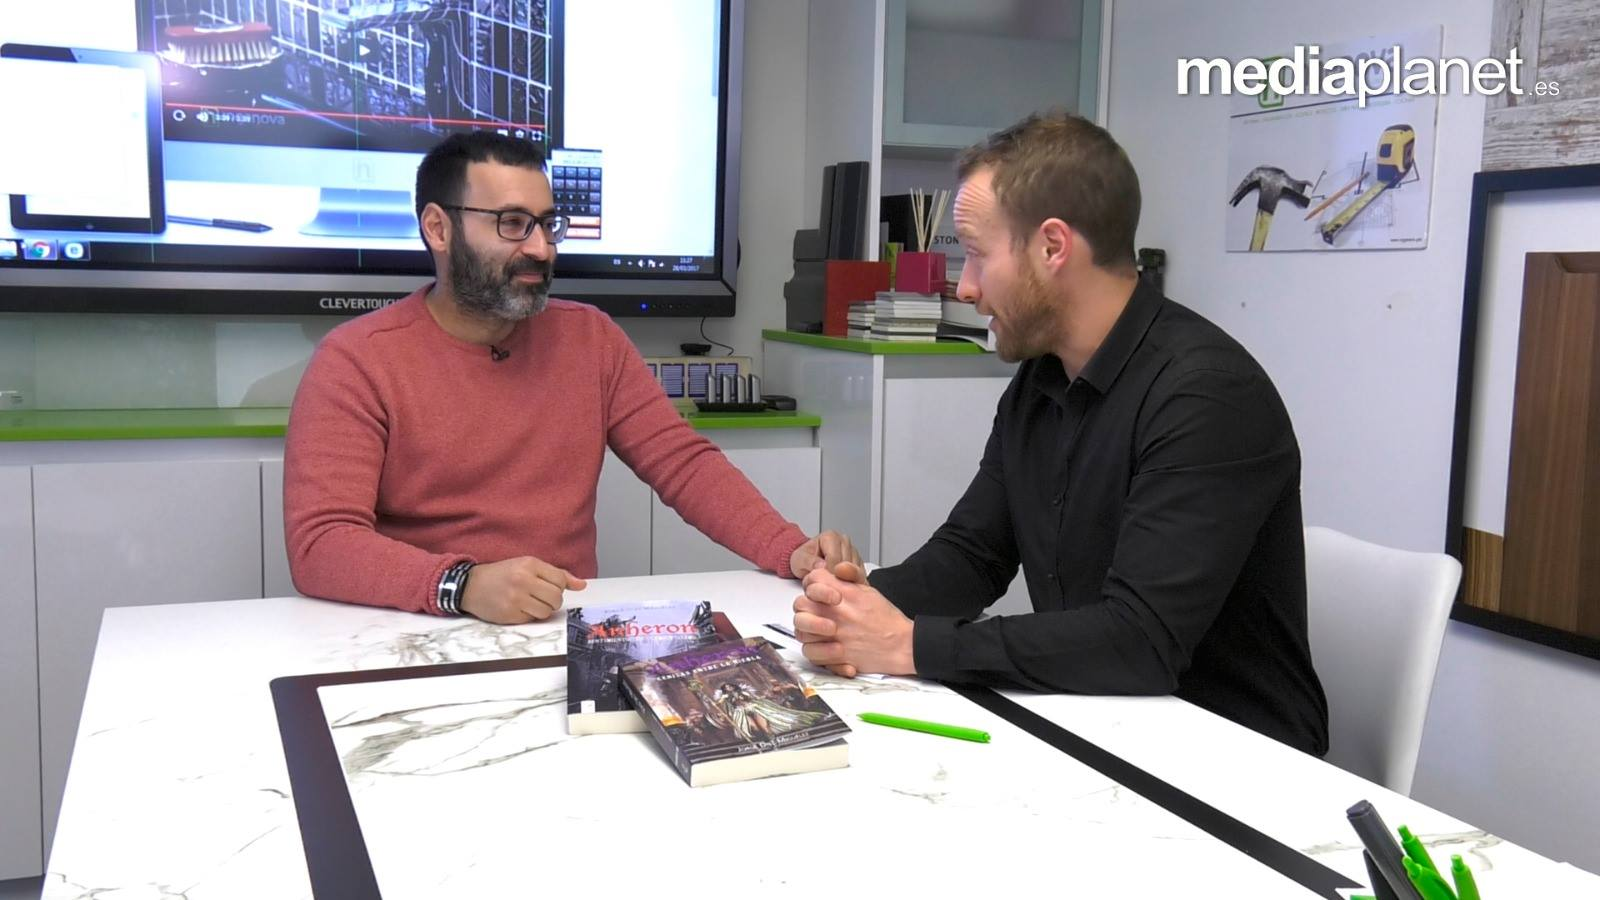 Entrevista - Mediaplanet C8Tv